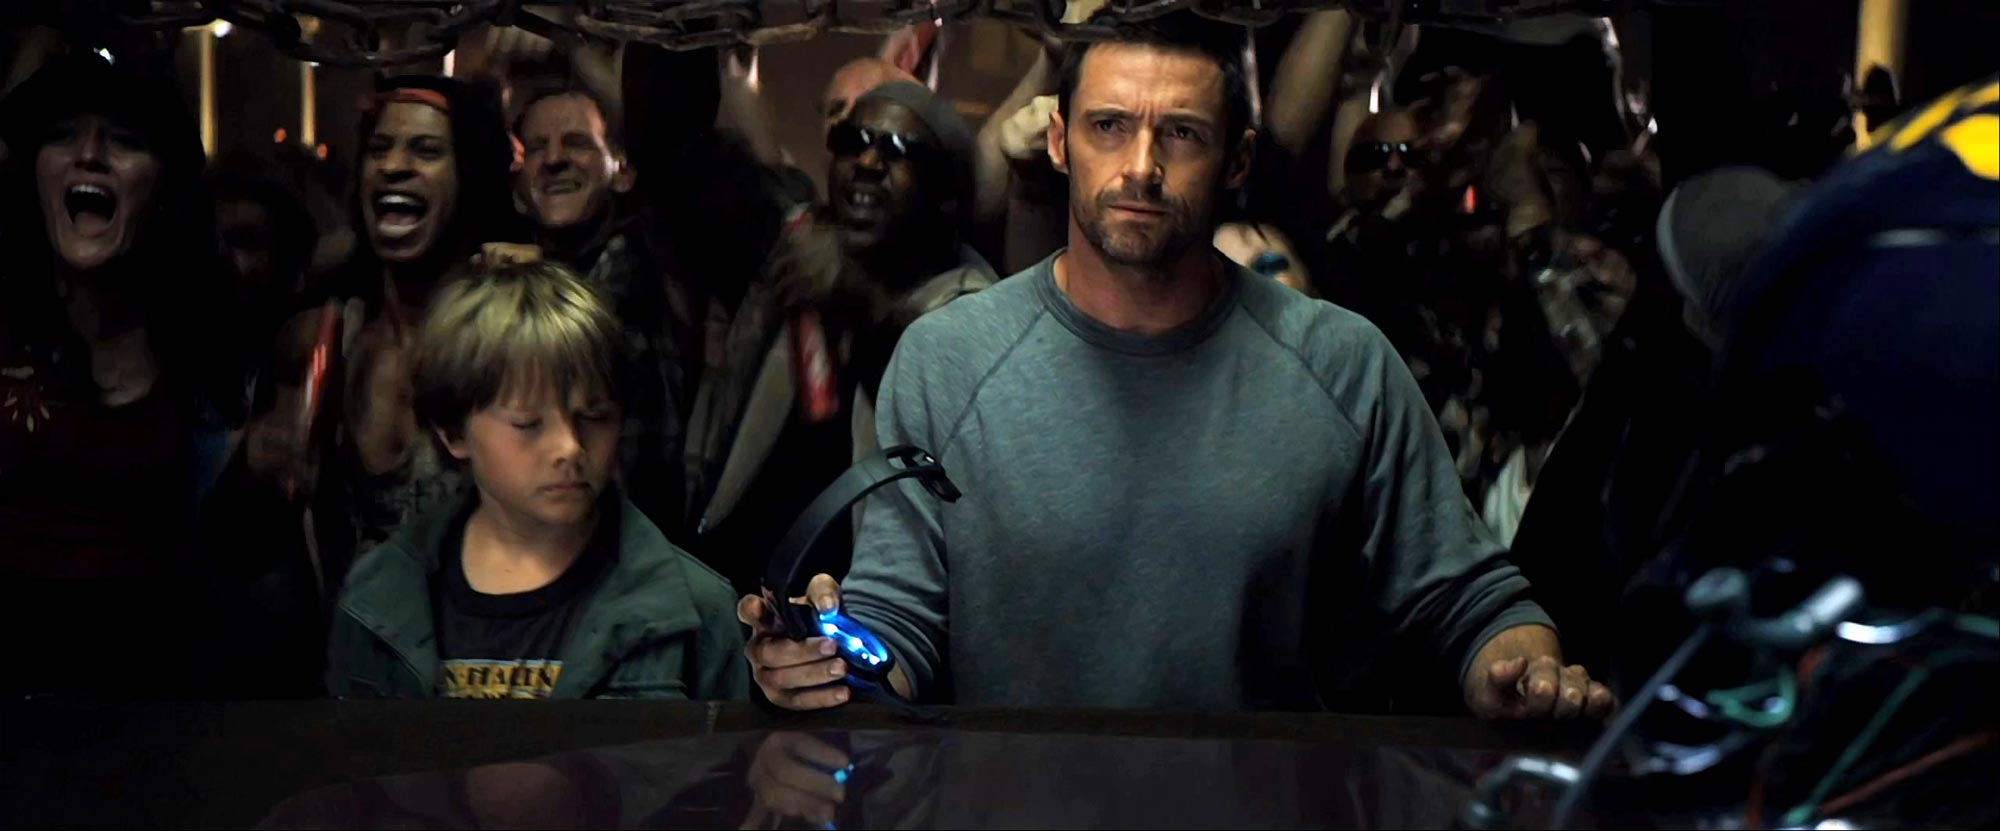 Hugh Jackman, Real Steel Movie Photo